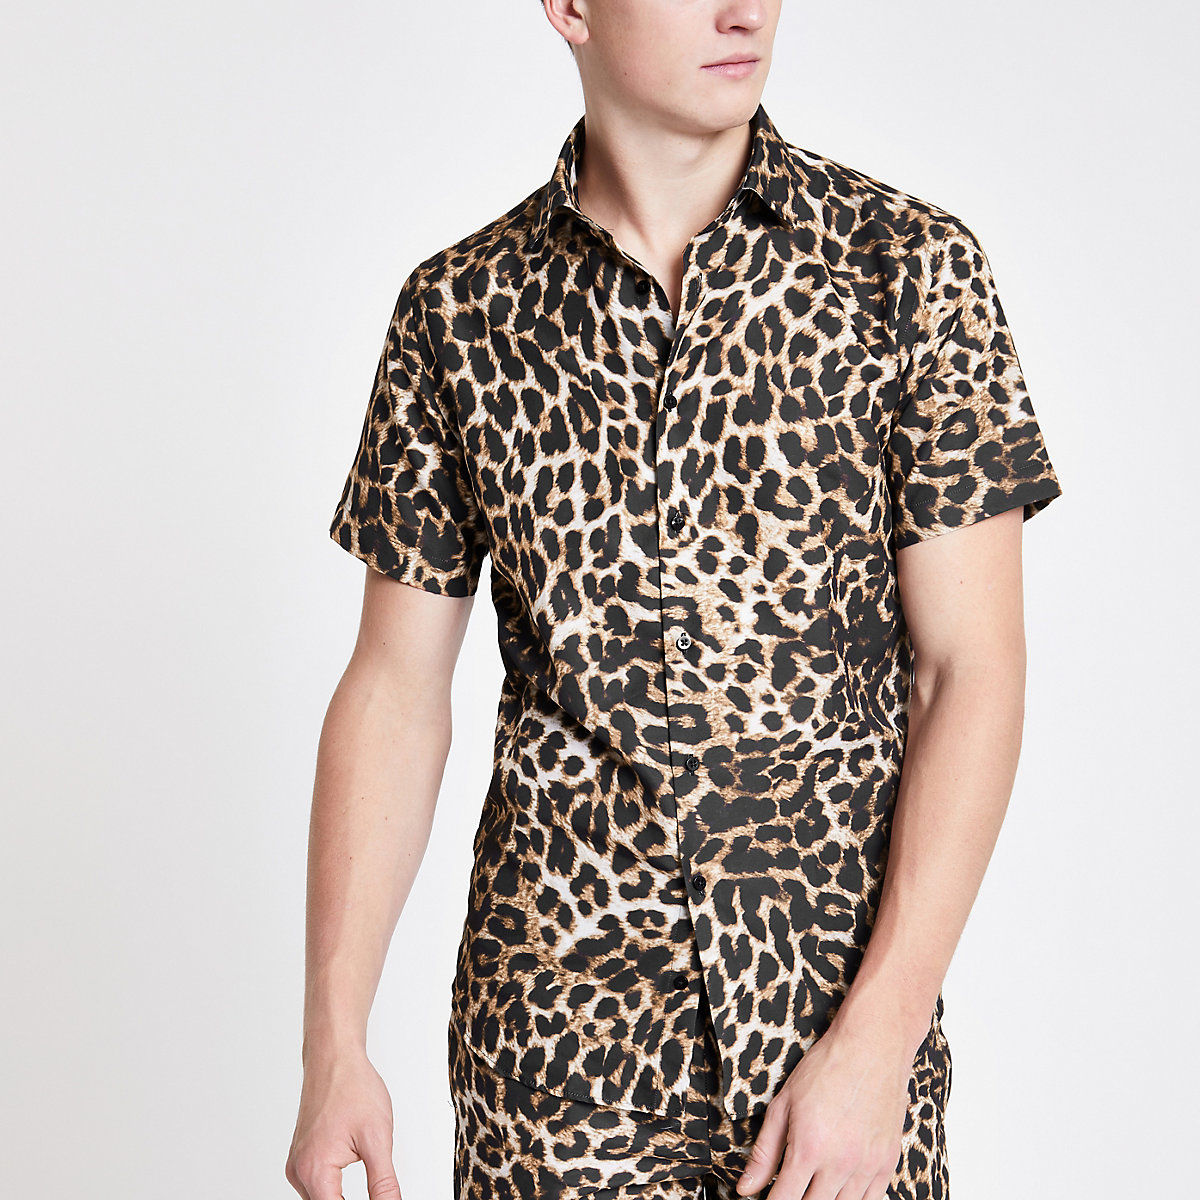 Criminal Damage brown leopard print shirt